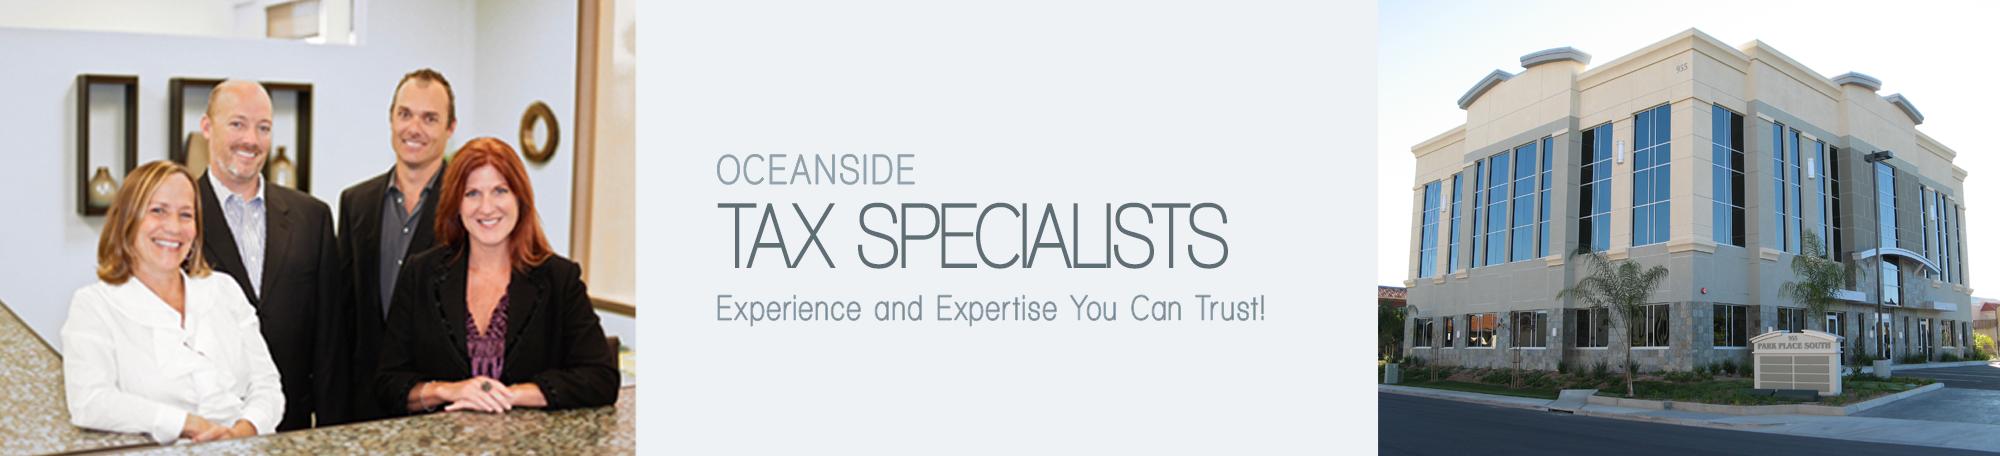 Oceanside Tax Specialists